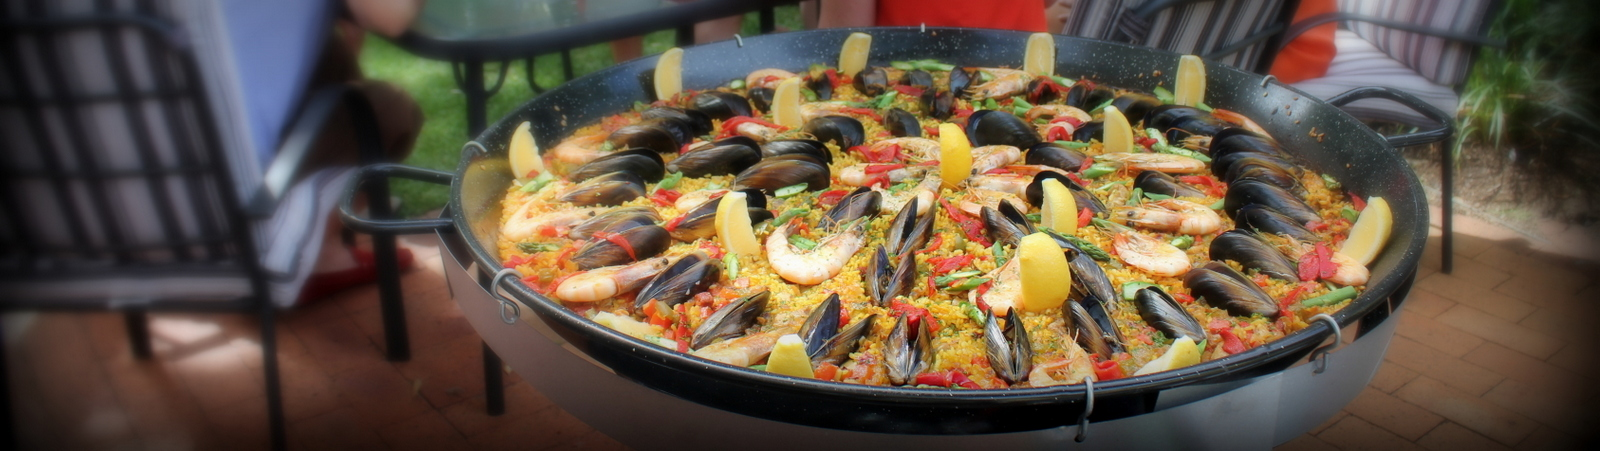 Paella Food Fiesta!